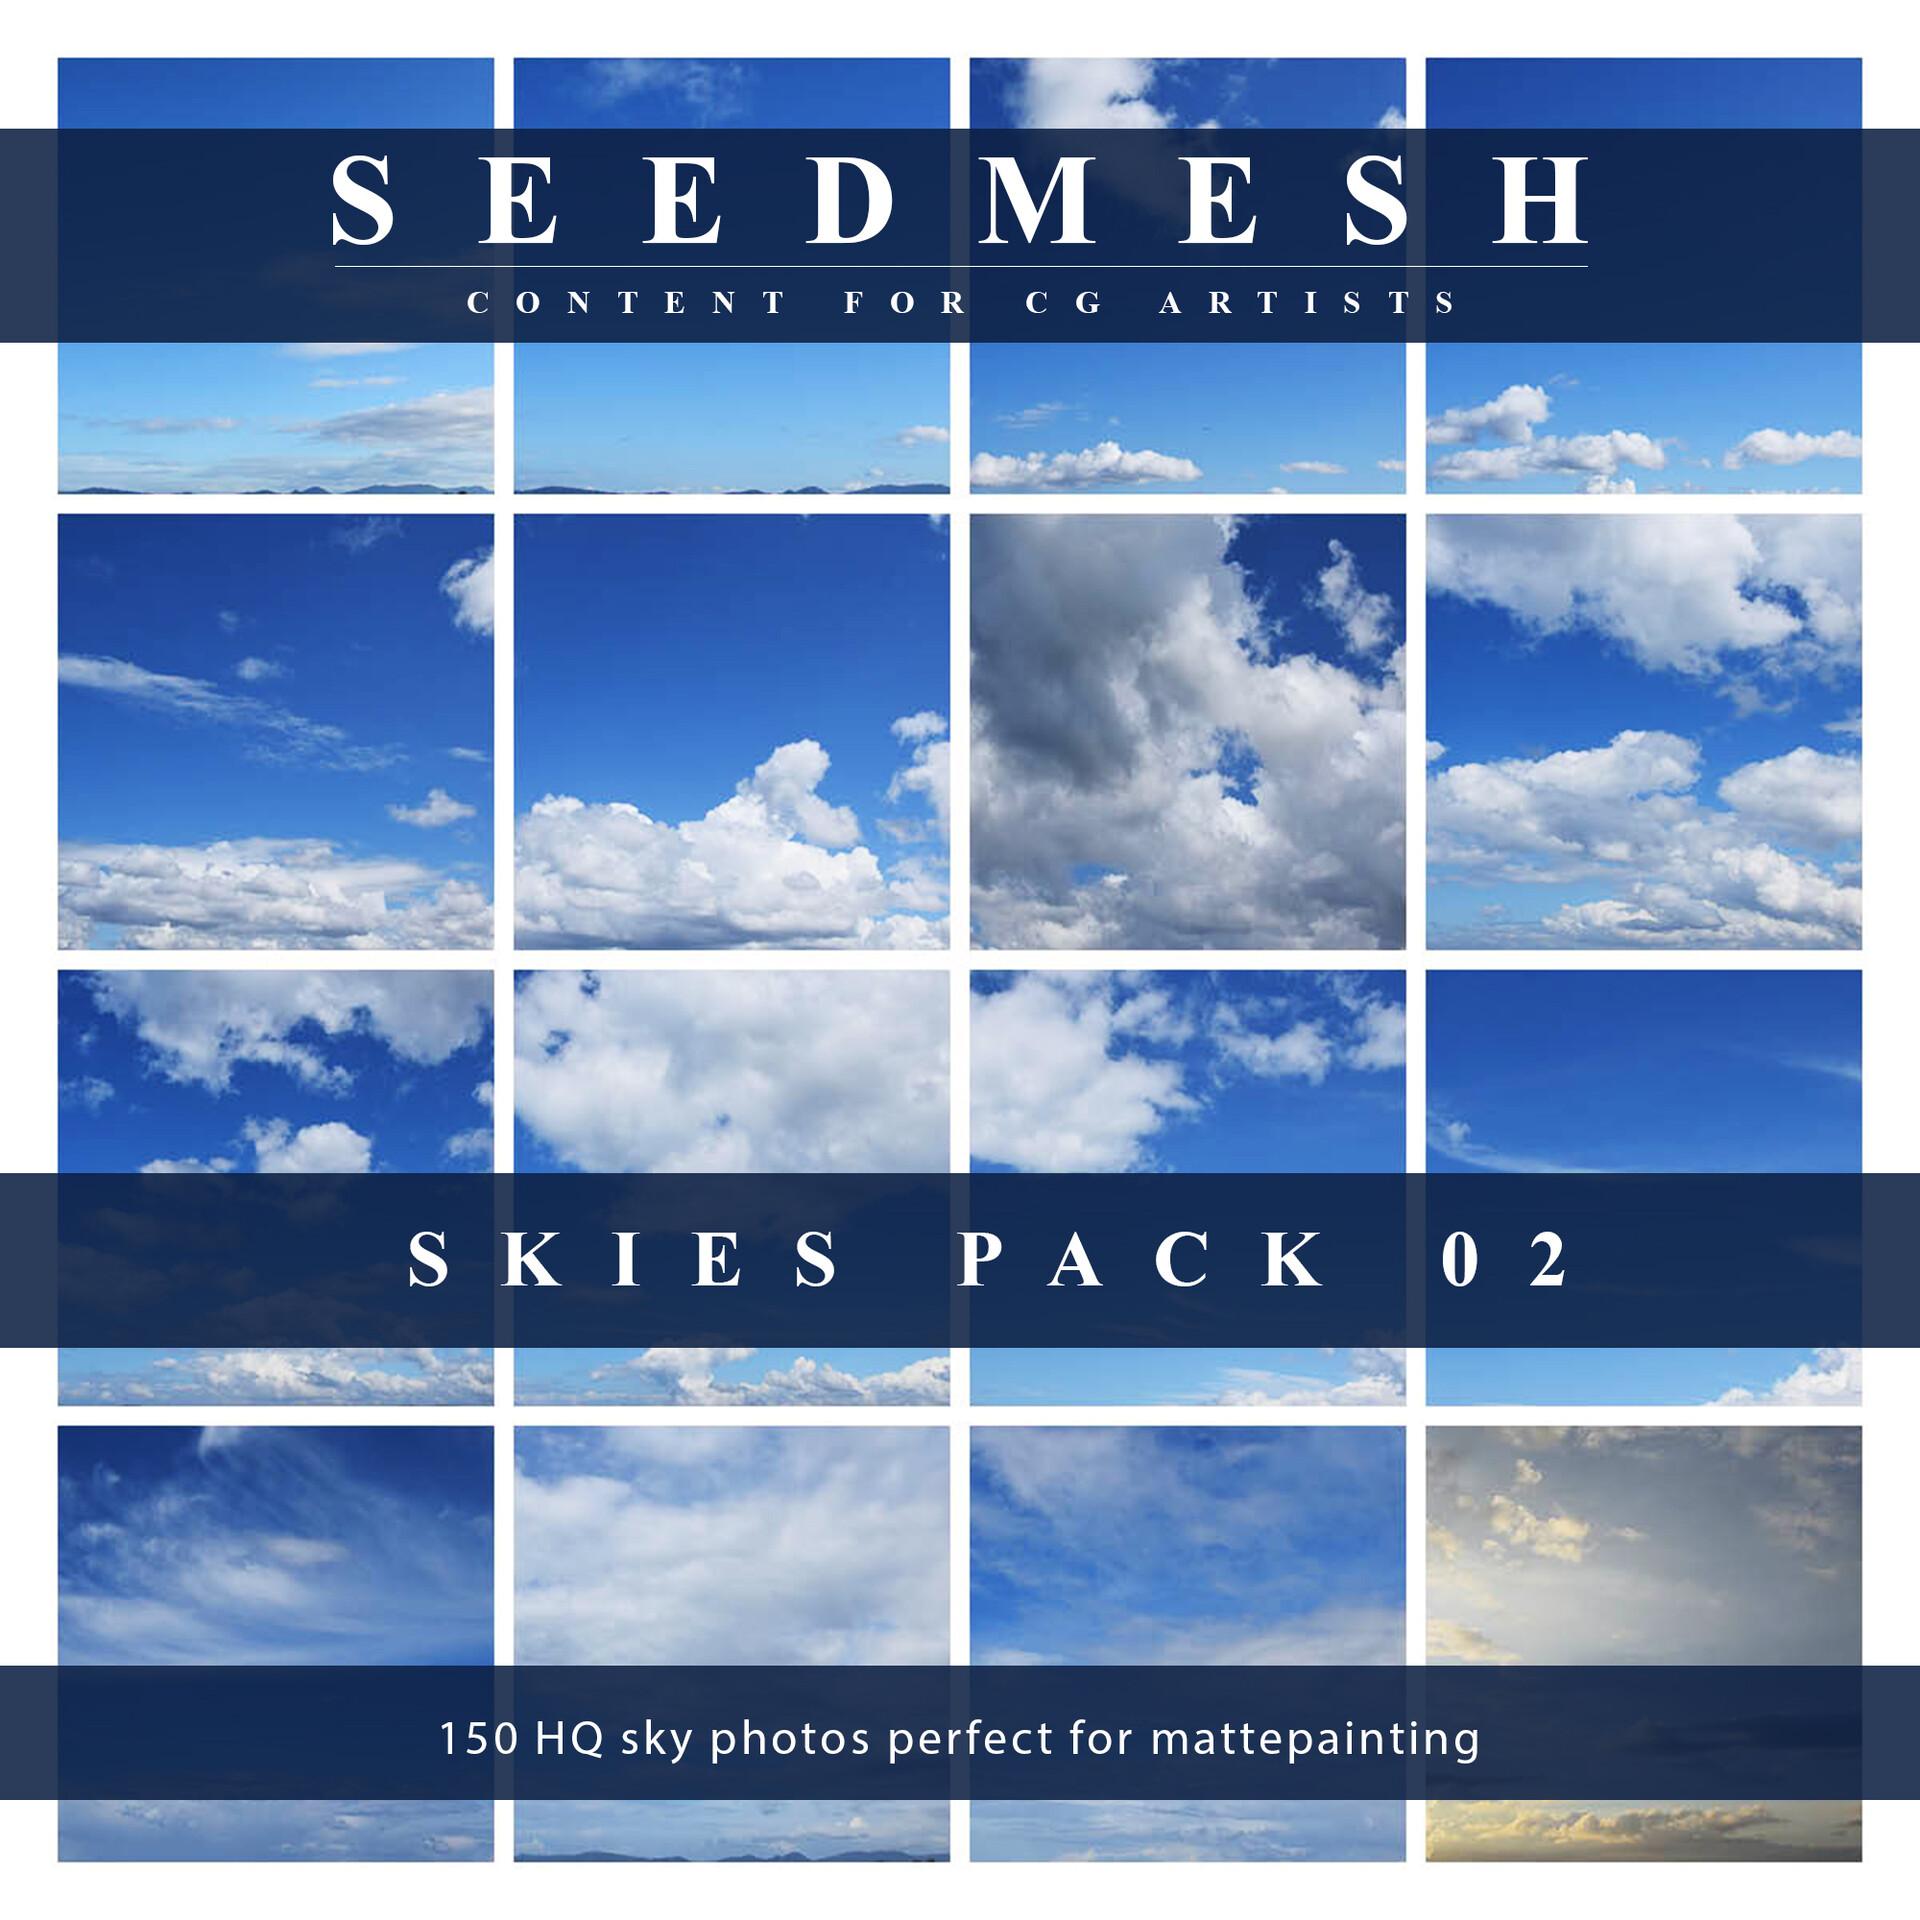 ArtStation   SKIES PACK 12. 12 HQ sky photos, Seedmesh Resources